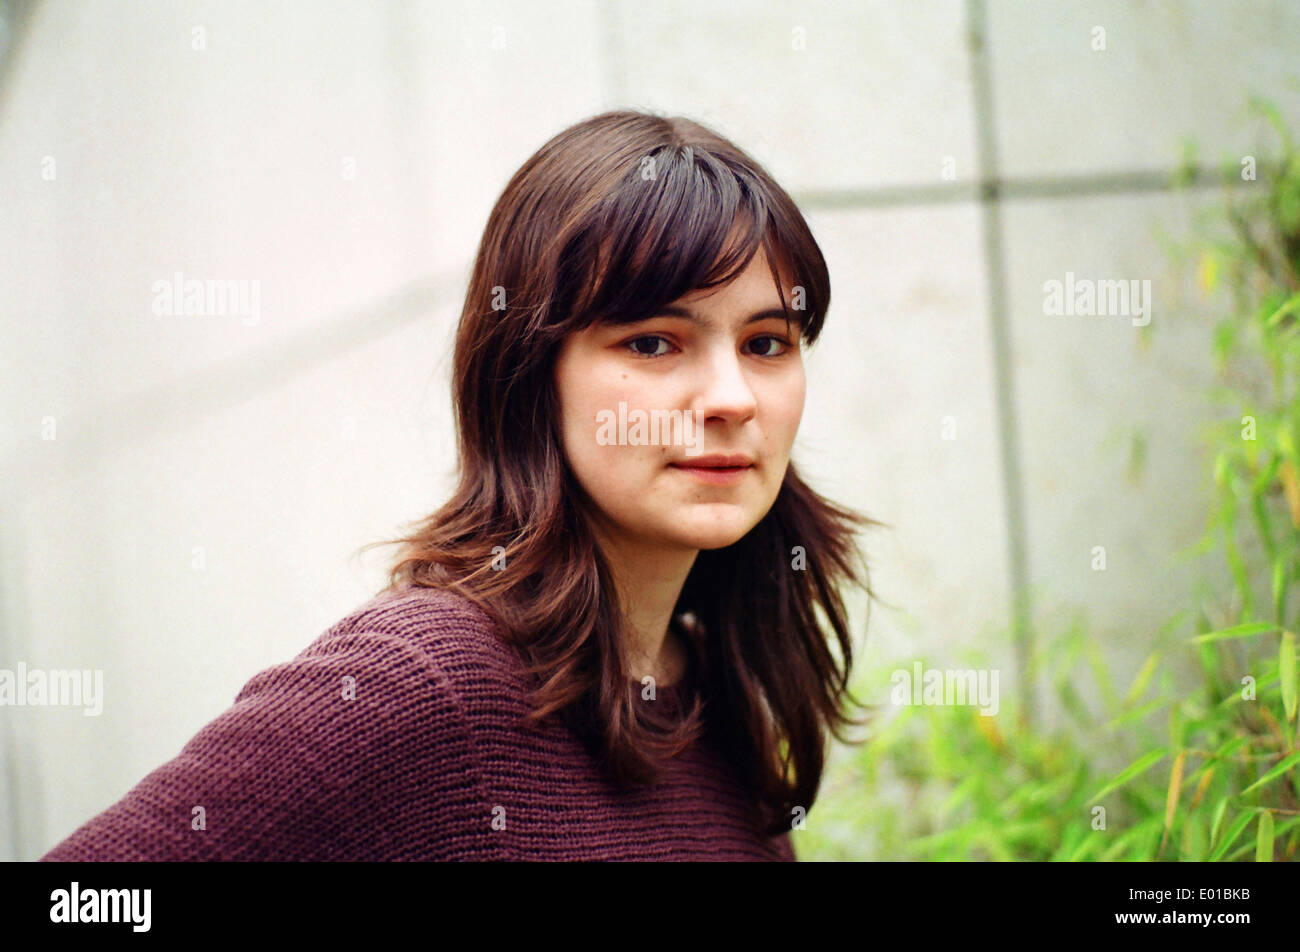 Sally Nicholls, 2009 - Stock Image